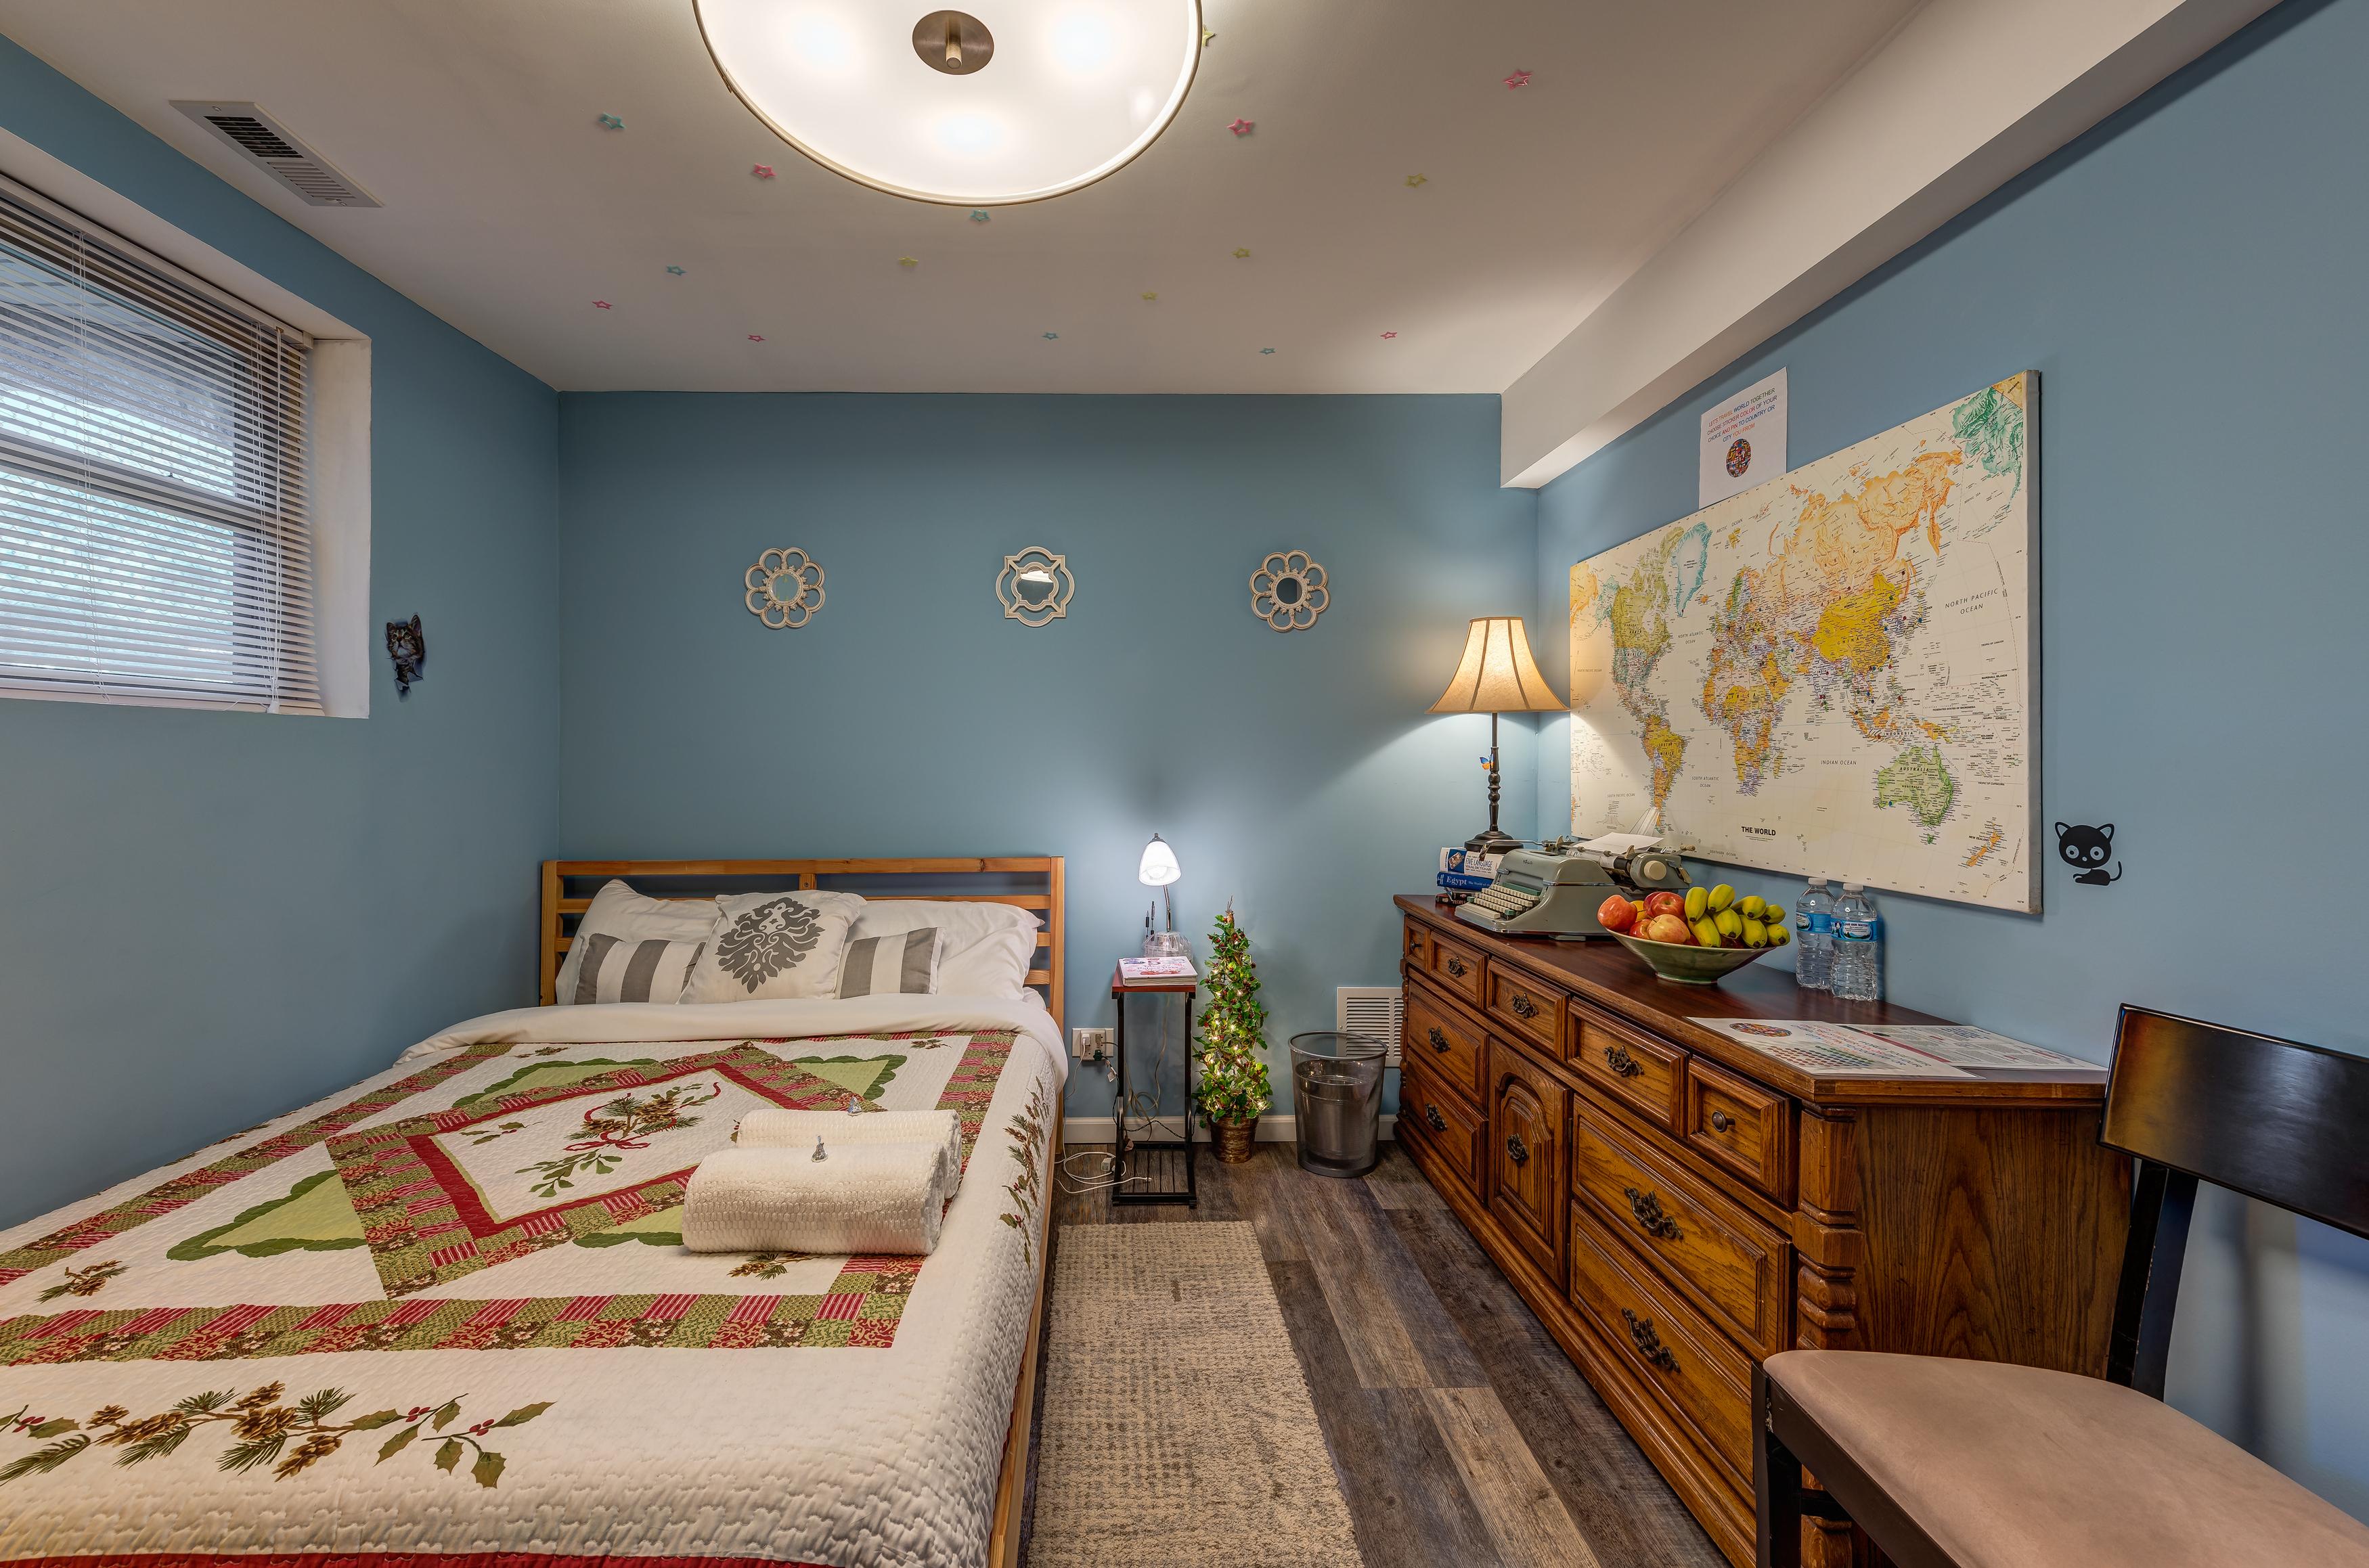 Apartment D-K-GNFamily Friendly Apartment near University  photo 23582673